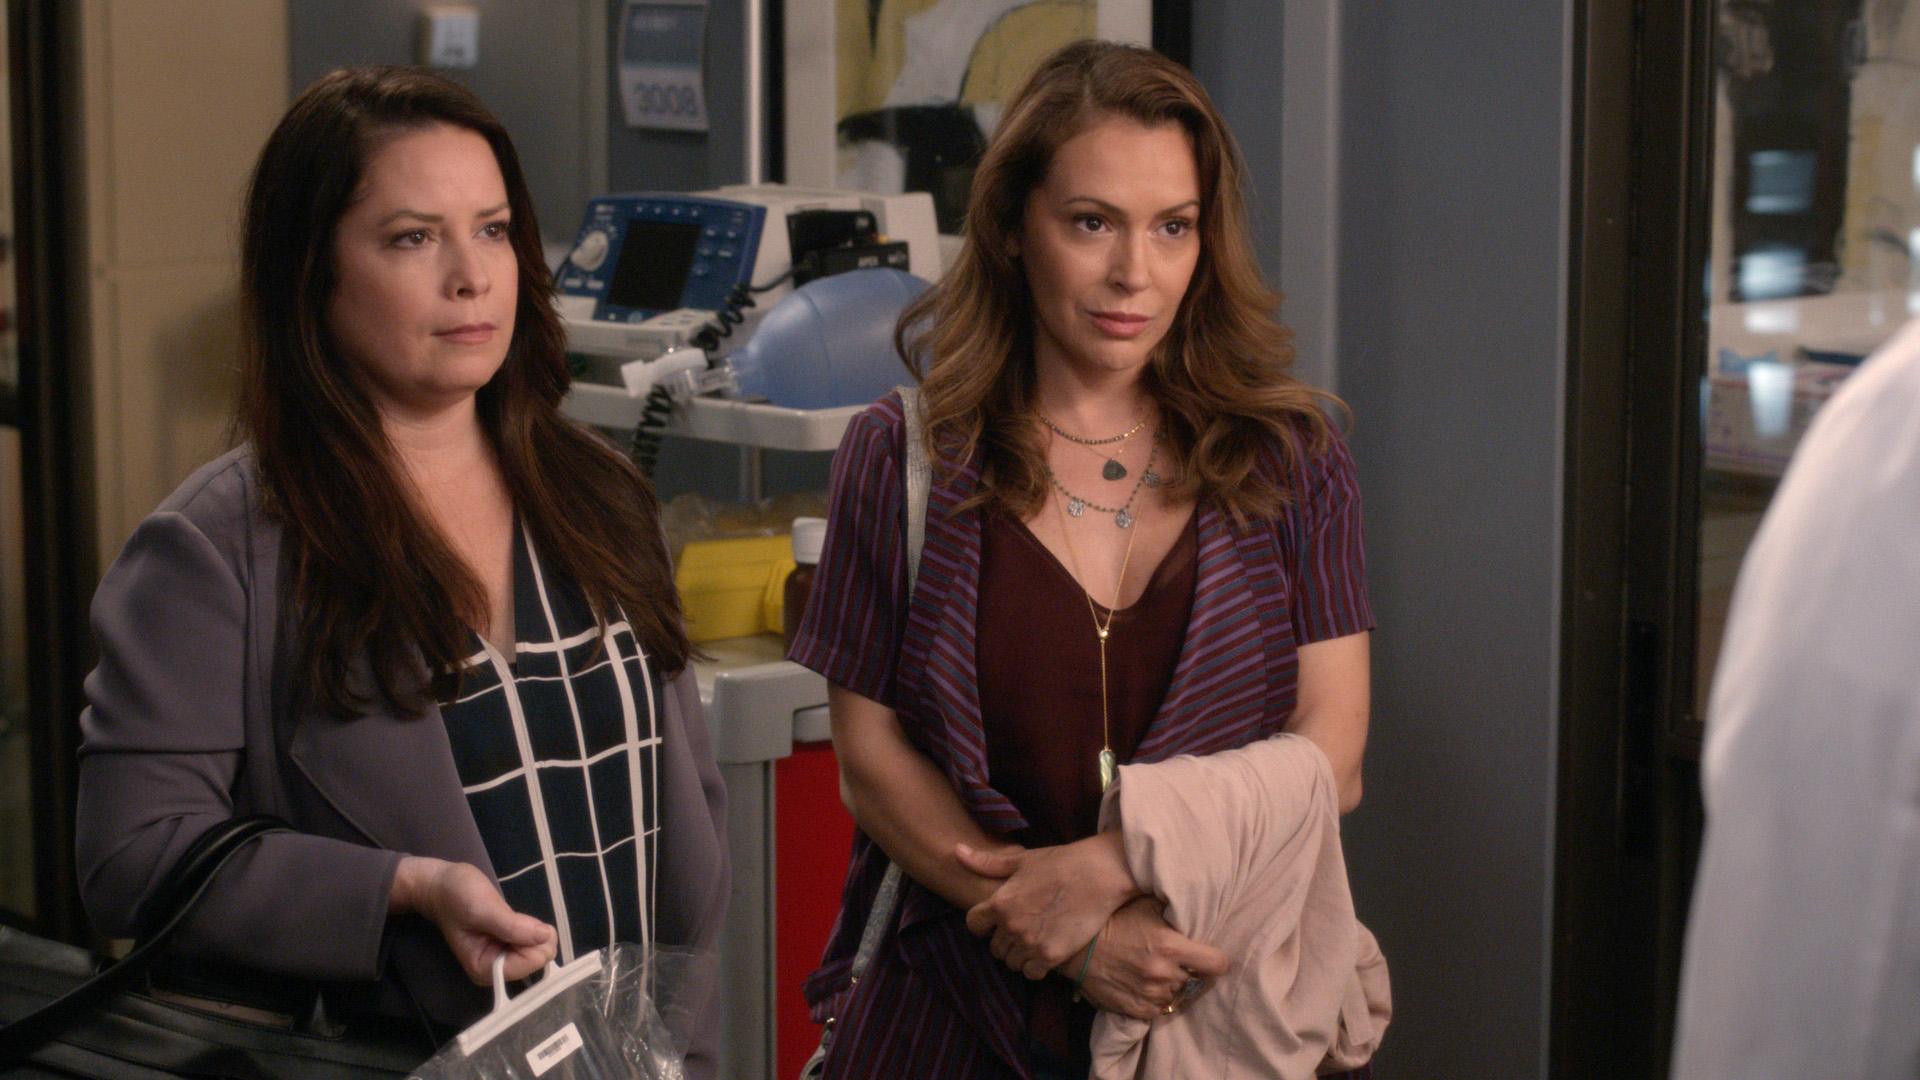 Grey S Anatomy Reunited Tv Episode 2019 Imdb